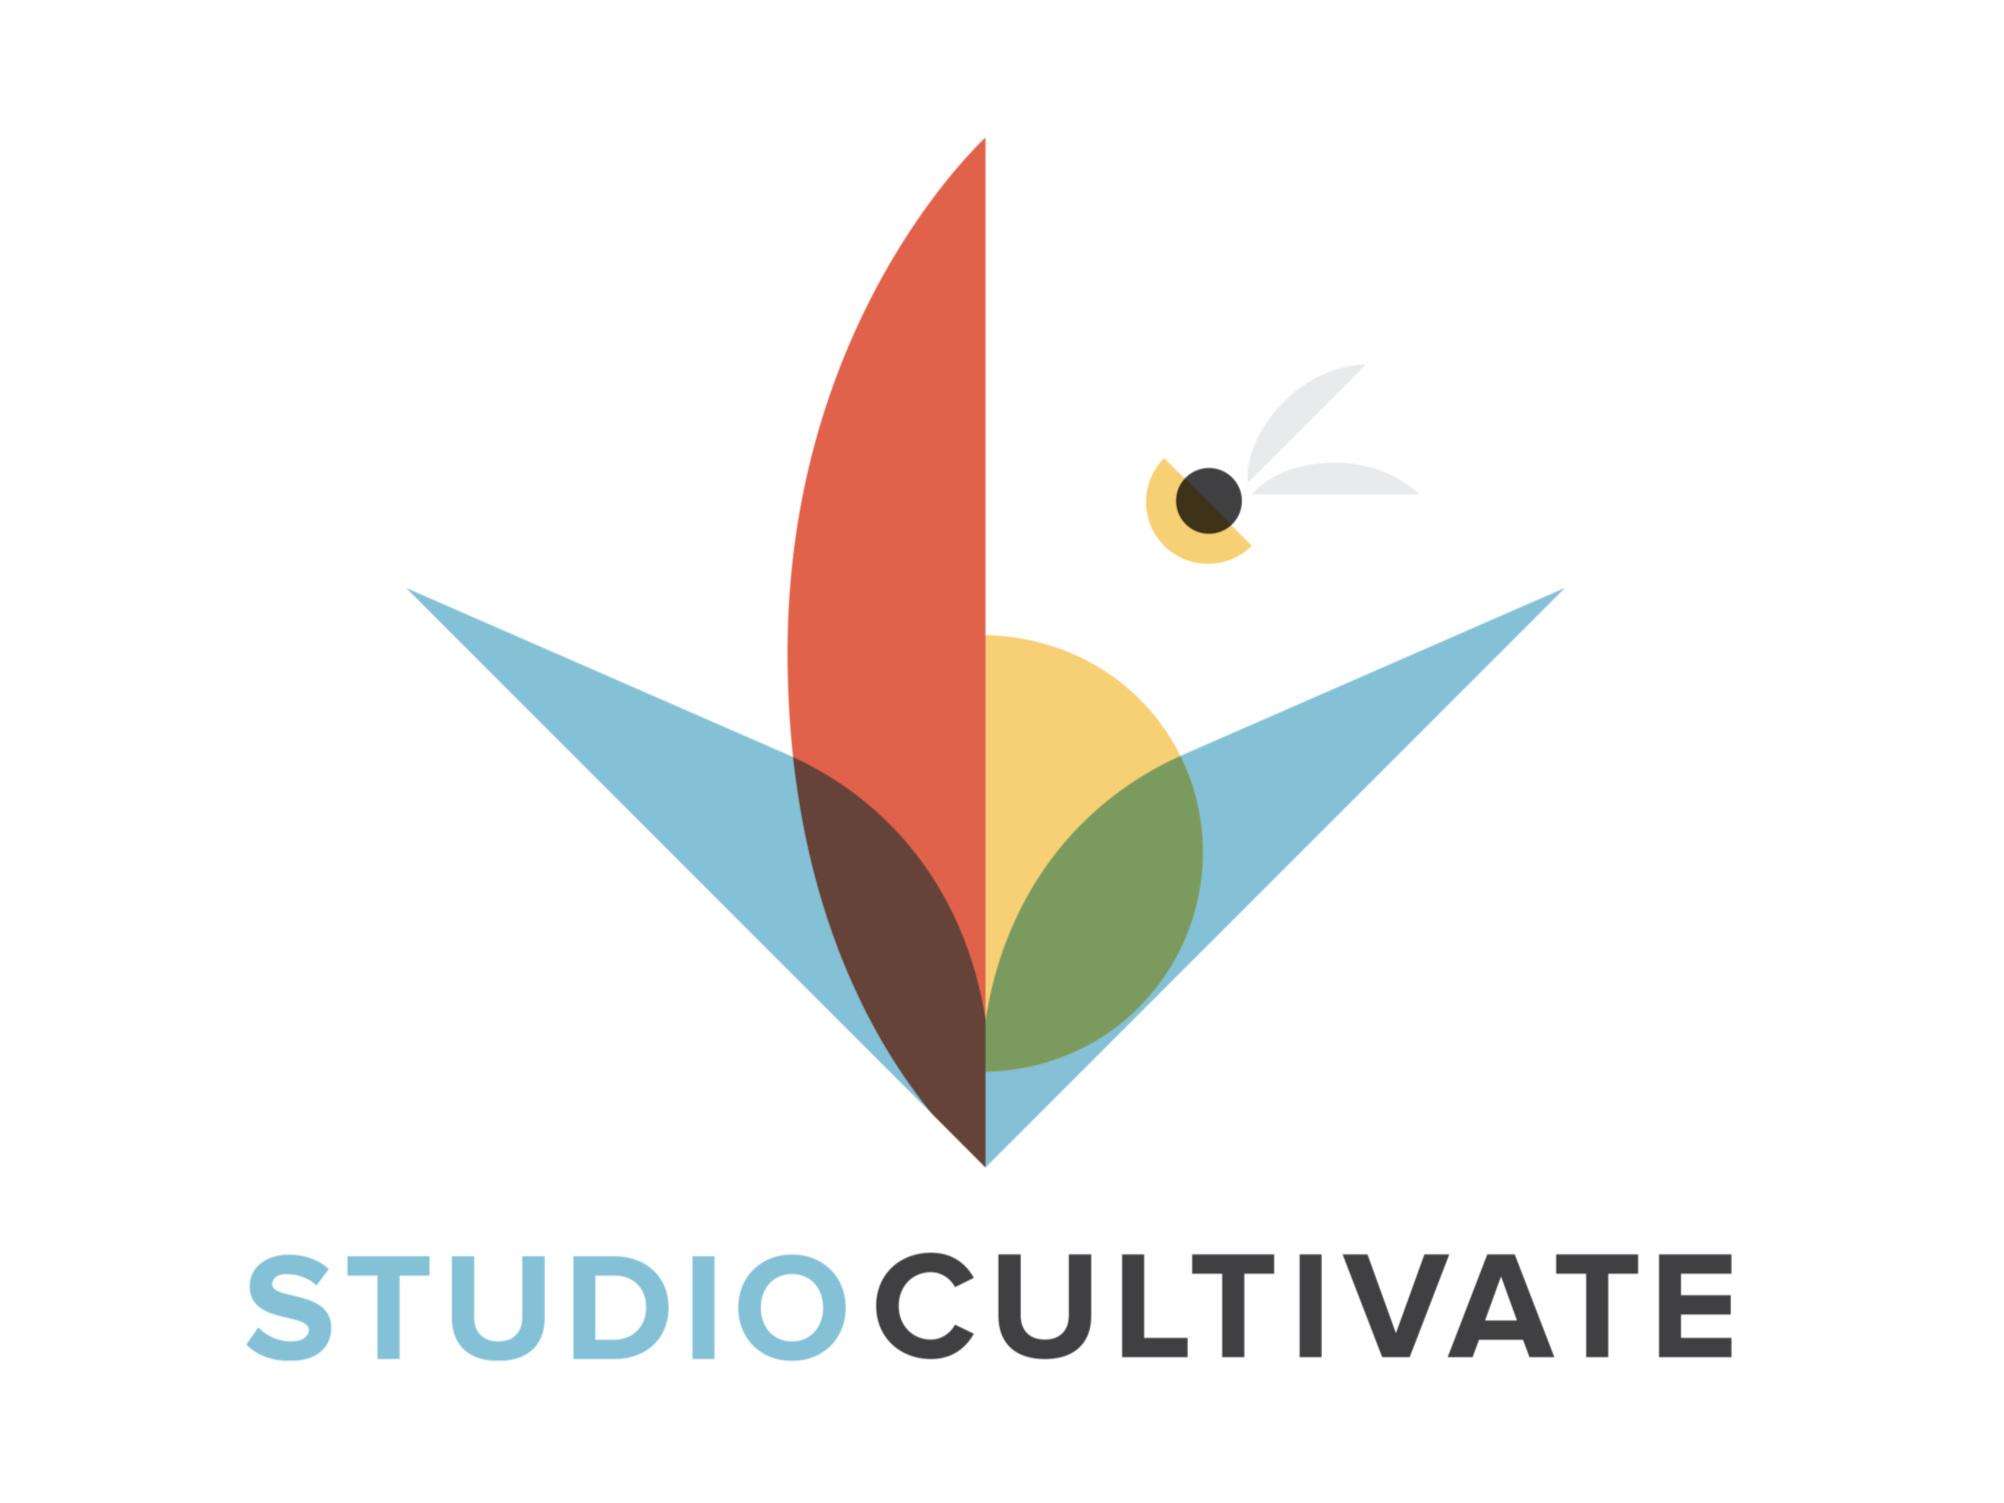 StudioCultivate_LOGO_COLOR%28LightBckg%29.jpg